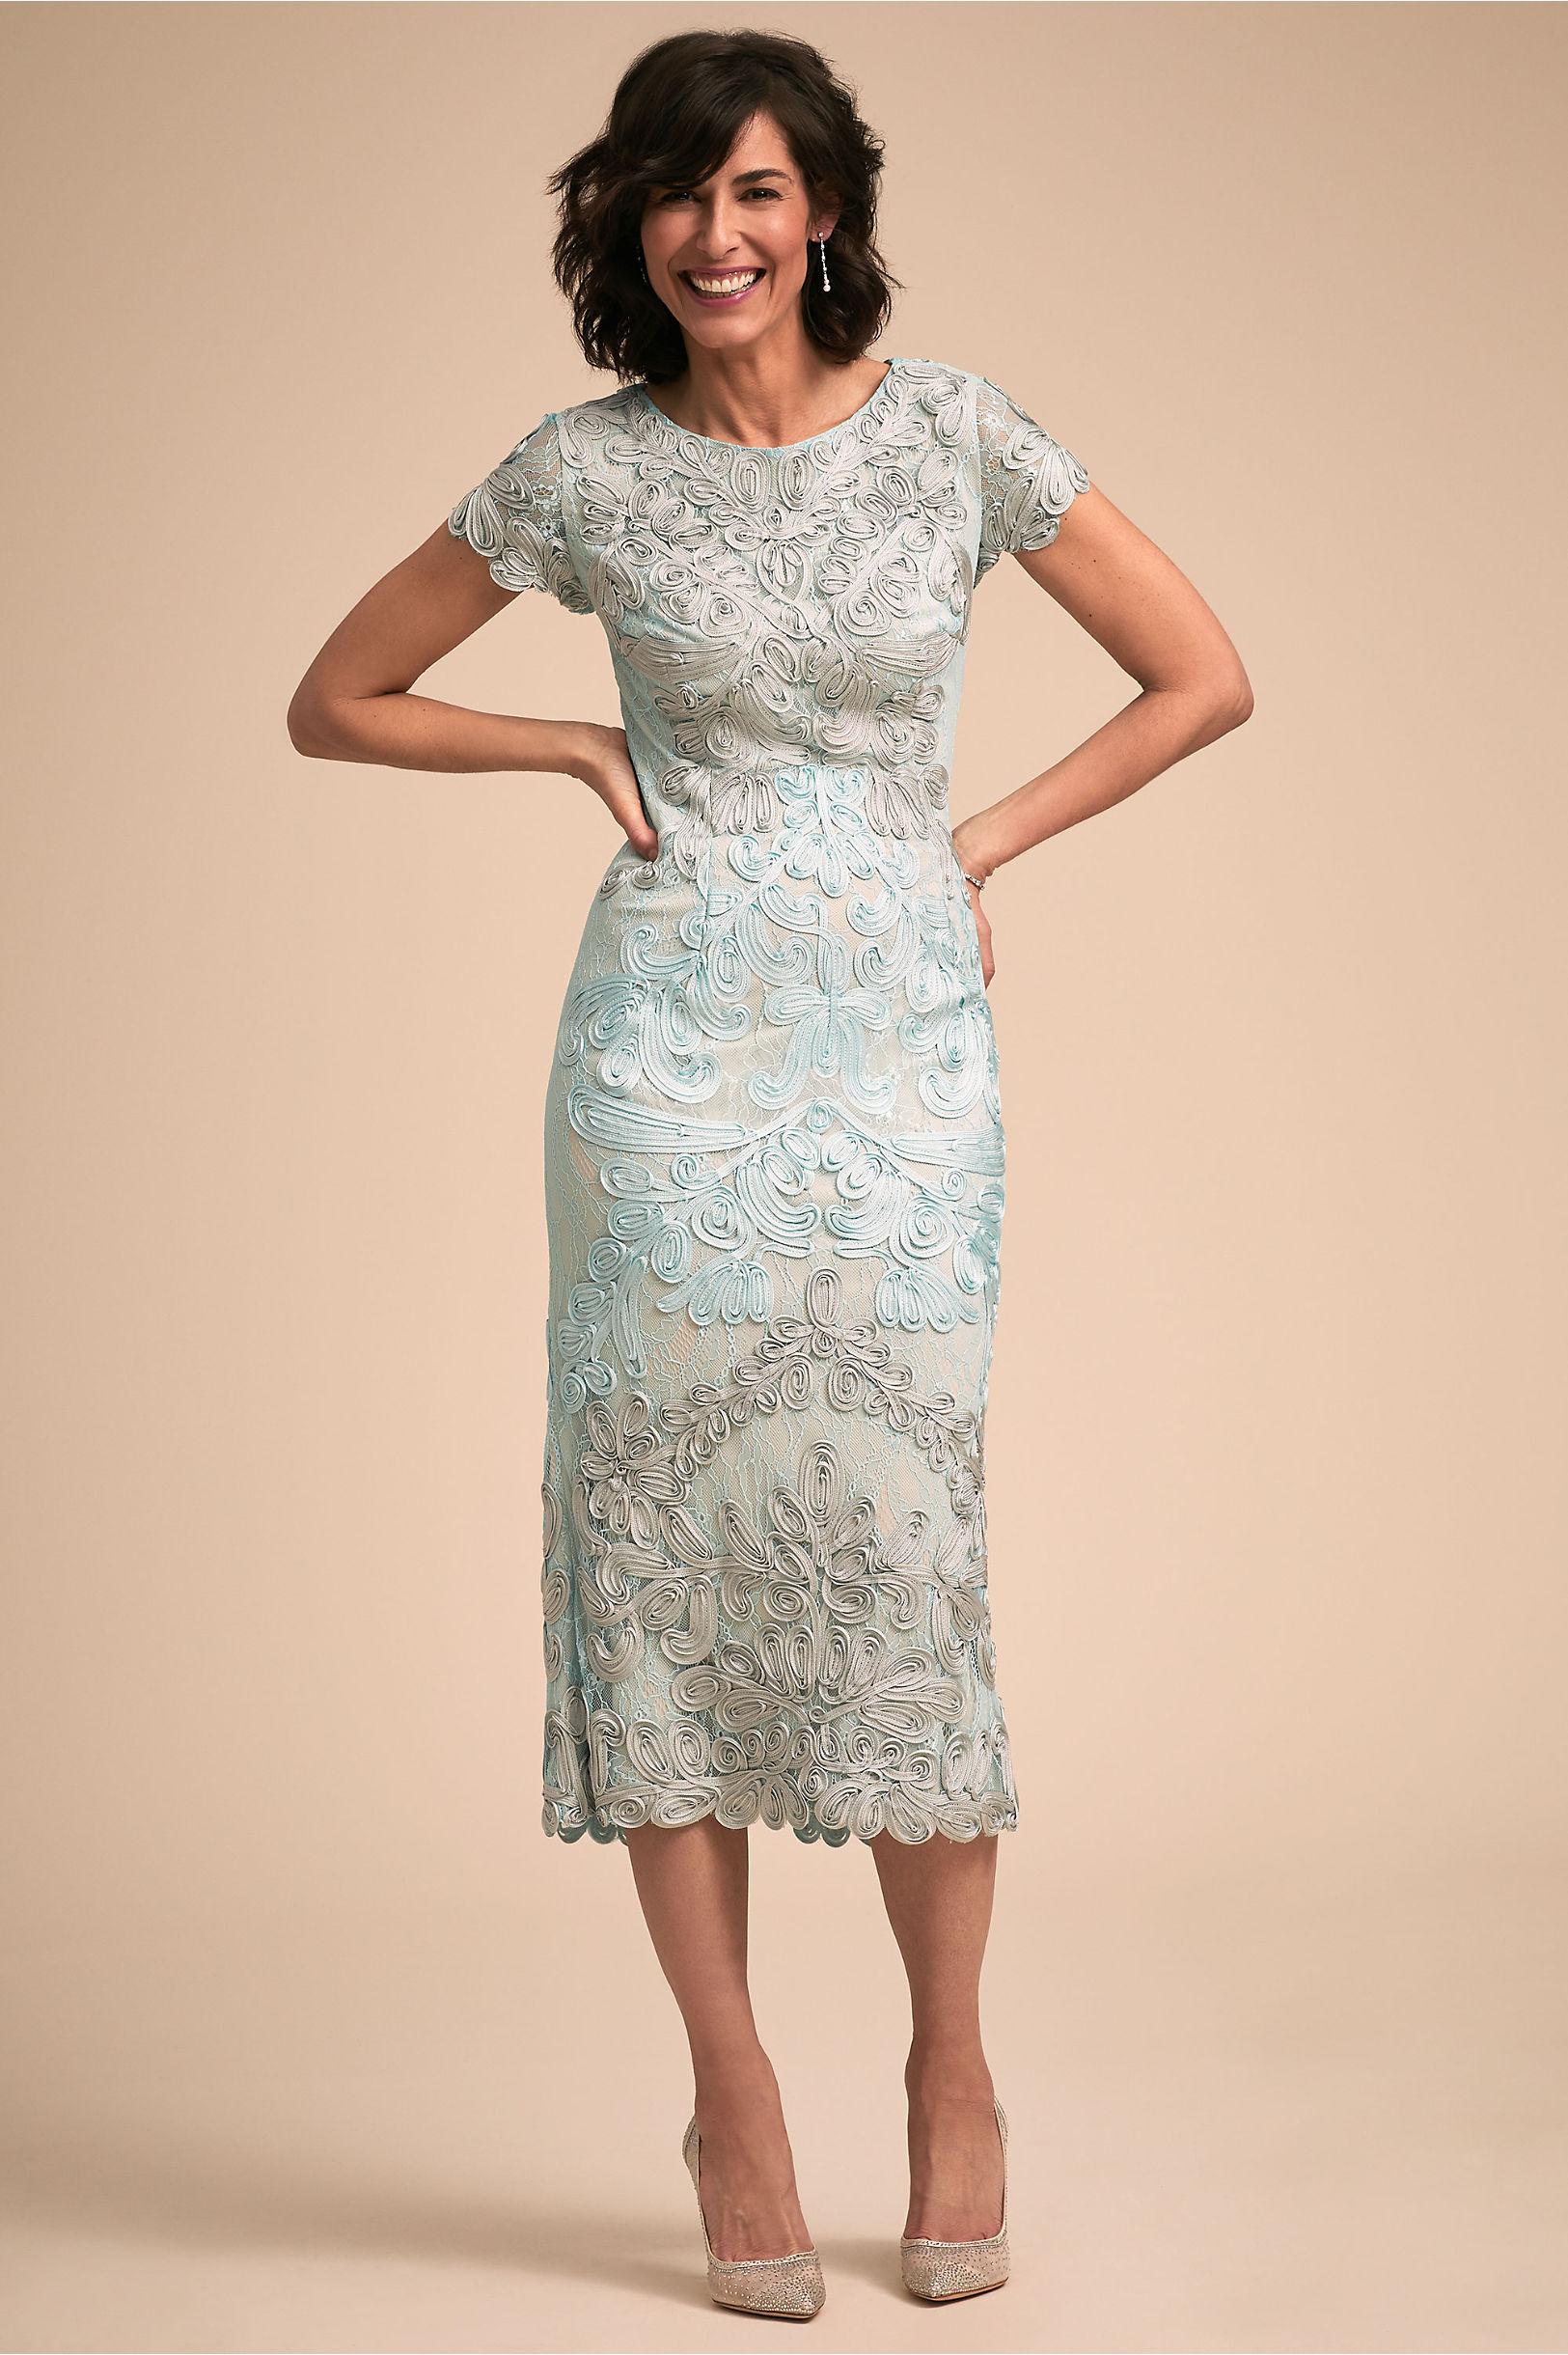 Santiago Dress in Sale   BHLDN